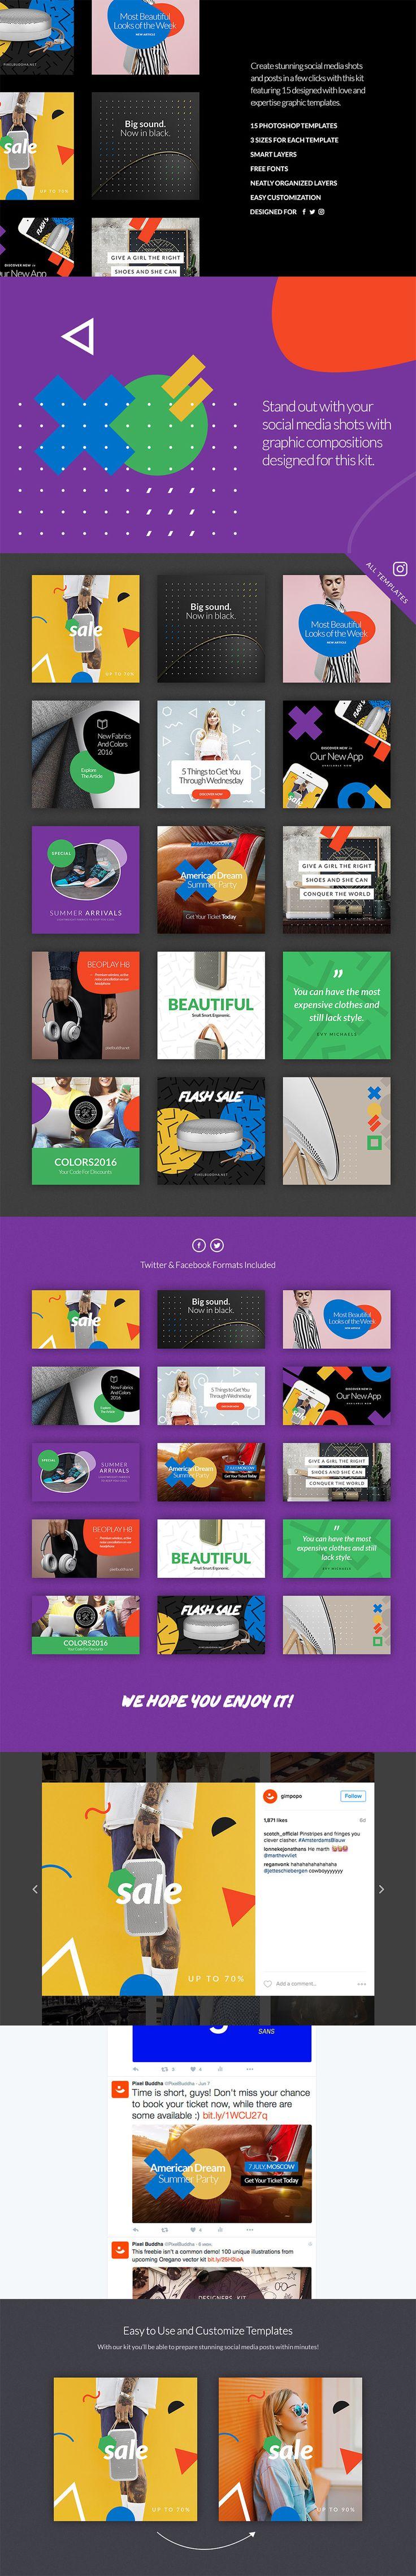 Social Media Booster Kit 2 - https://www.designcuts.com/product/social-media-booster-kit-2/